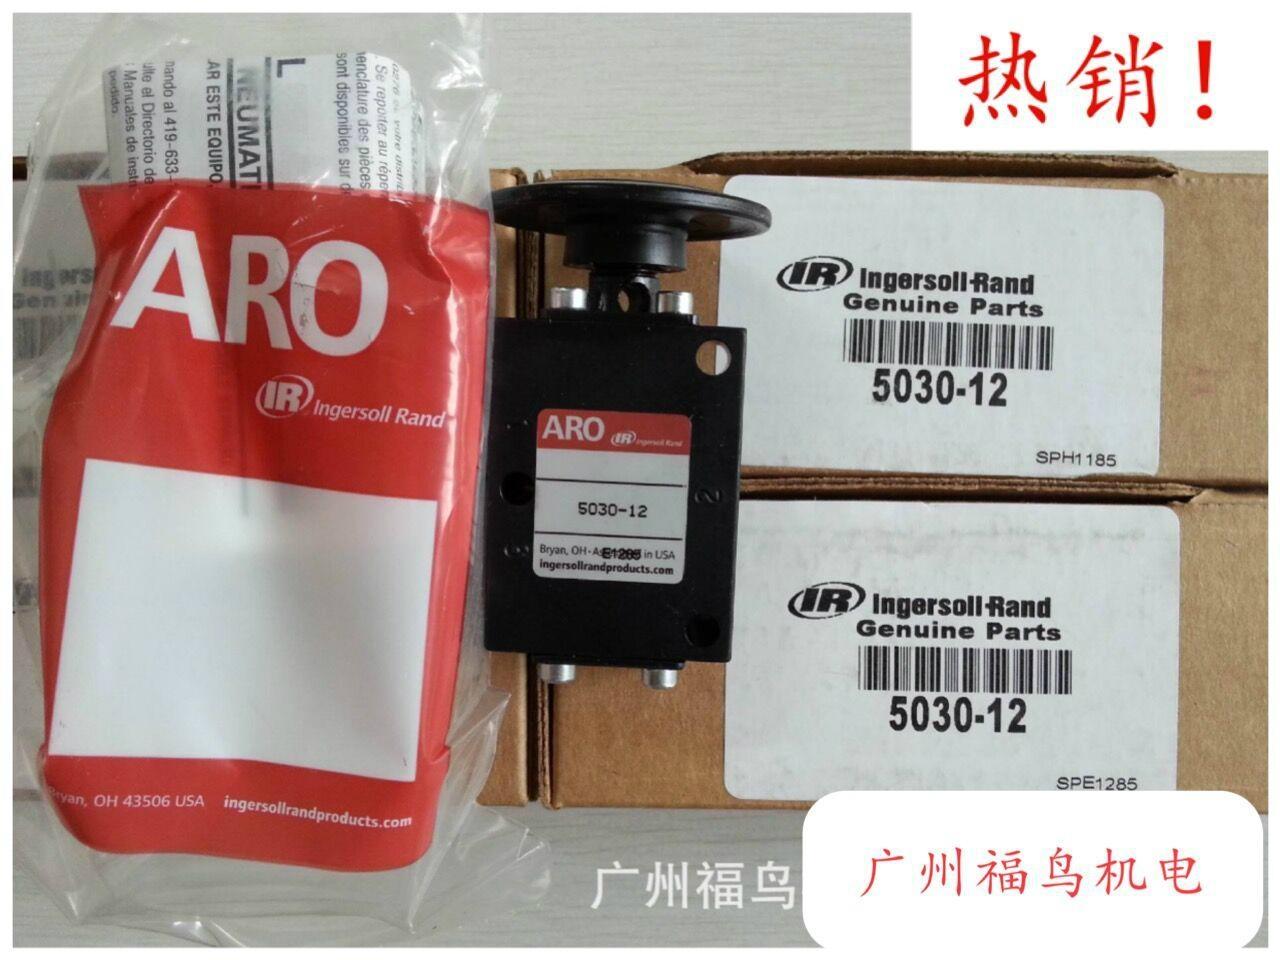 ARO手动阀, 型号:5030-12